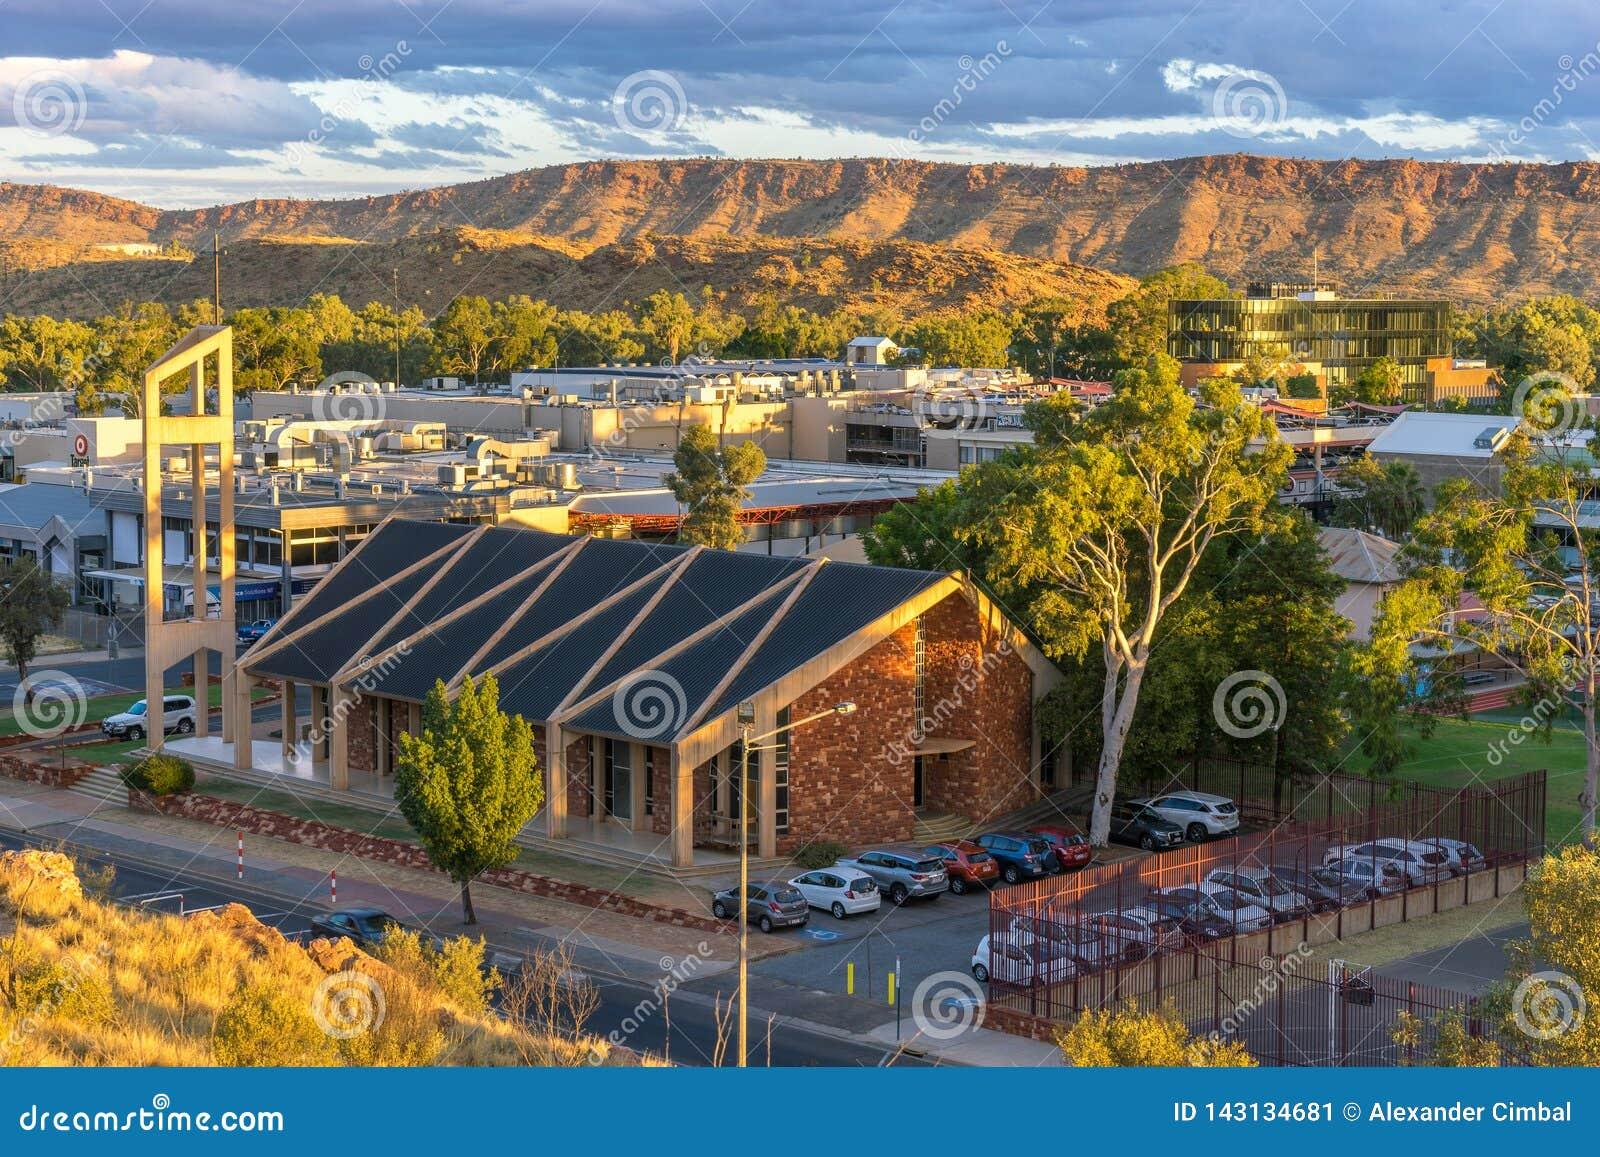 The Oasis, Alice Springs, Northern Territory.   Australian